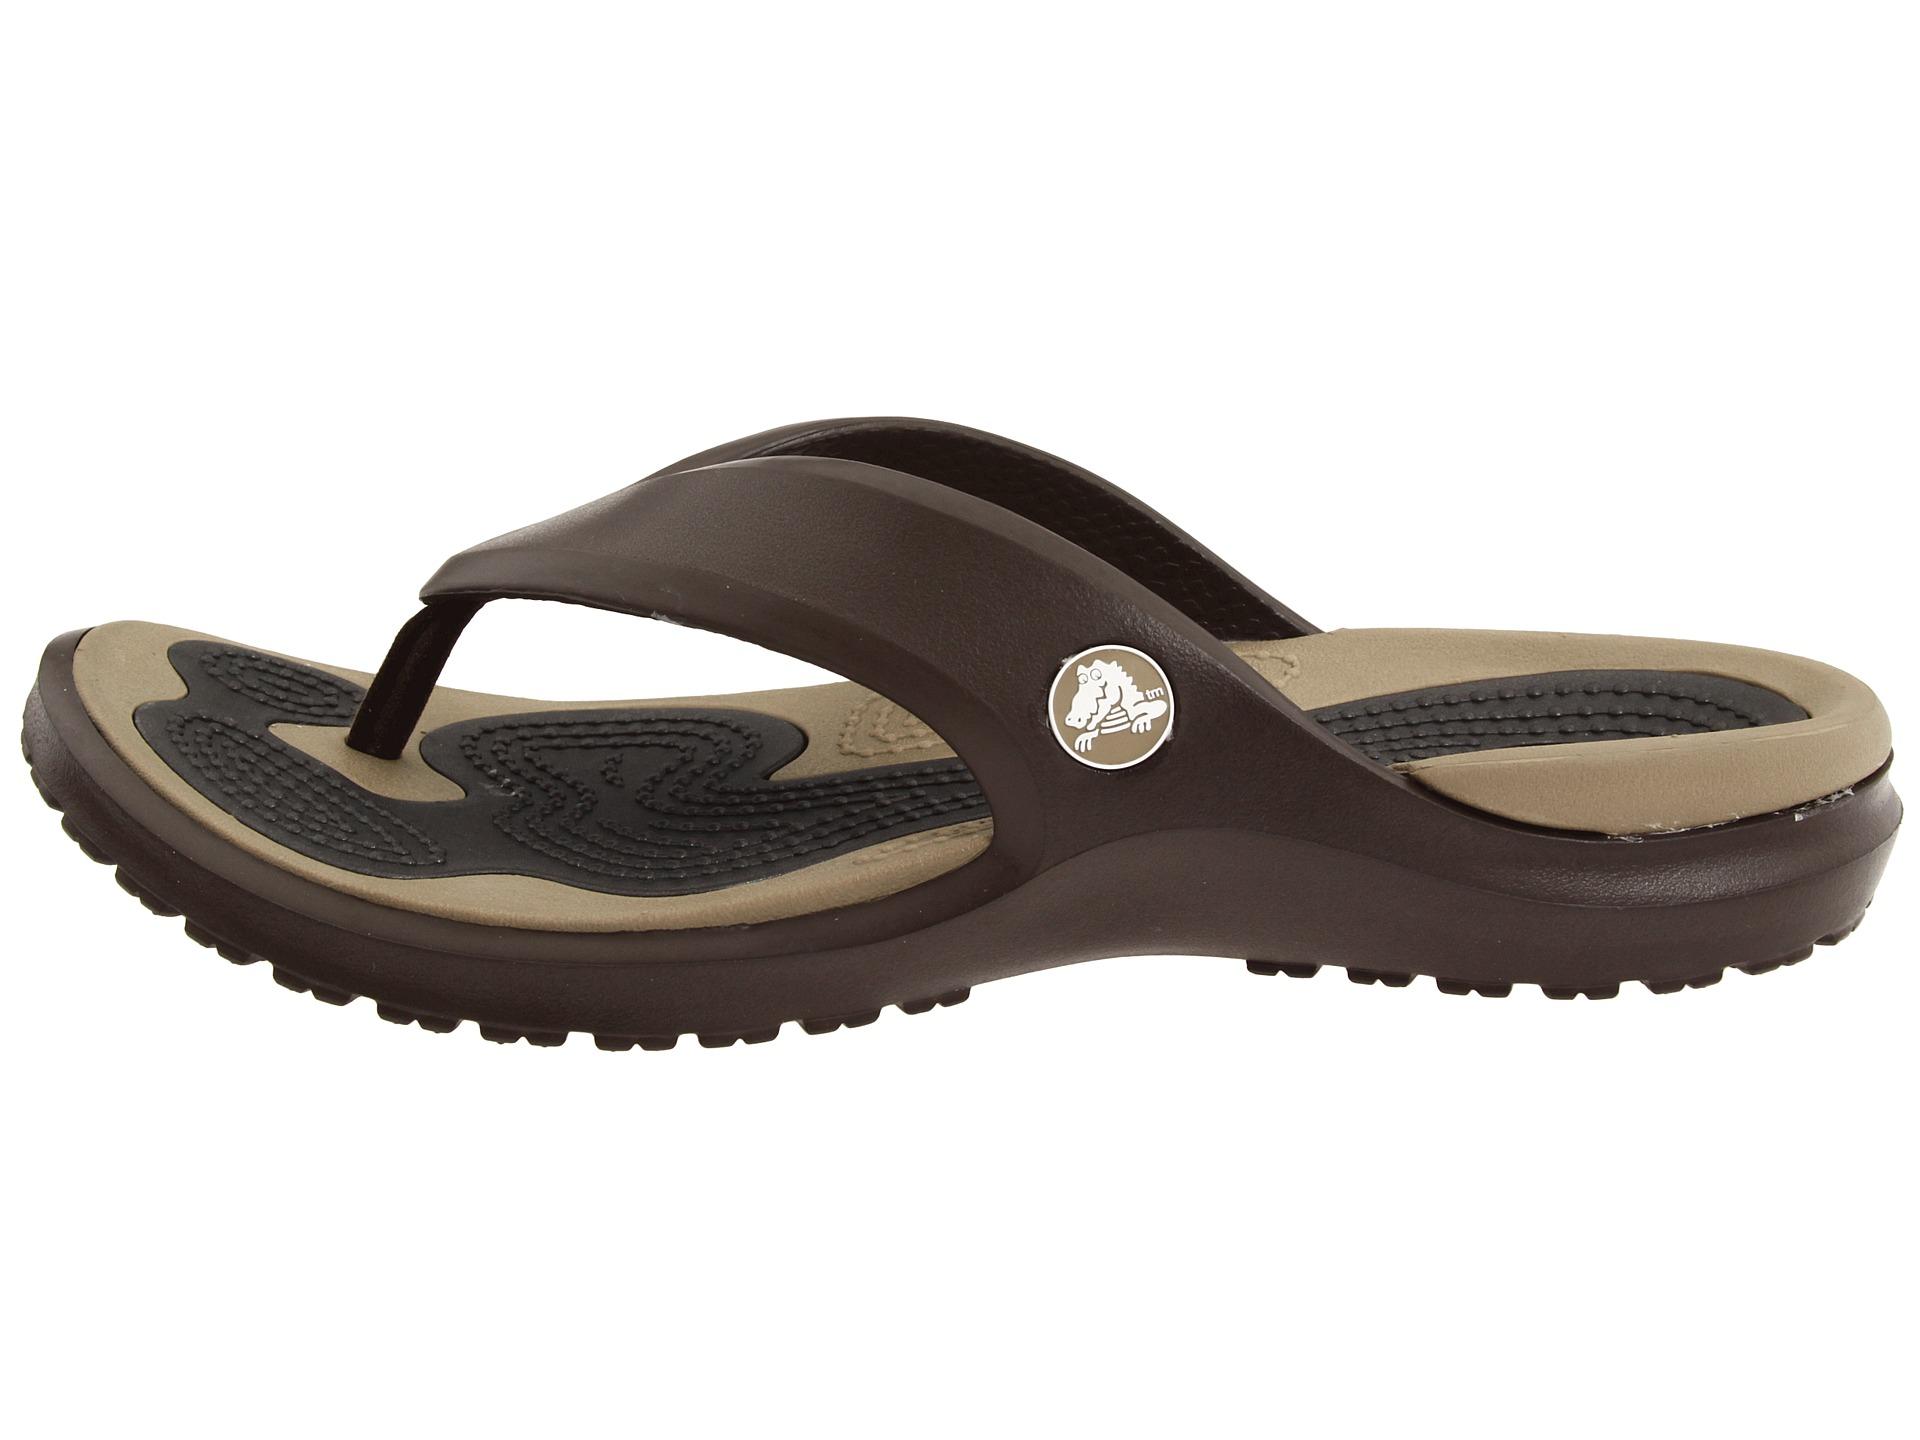 crocs modi flip shoes shipped free at zappos. Black Bedroom Furniture Sets. Home Design Ideas